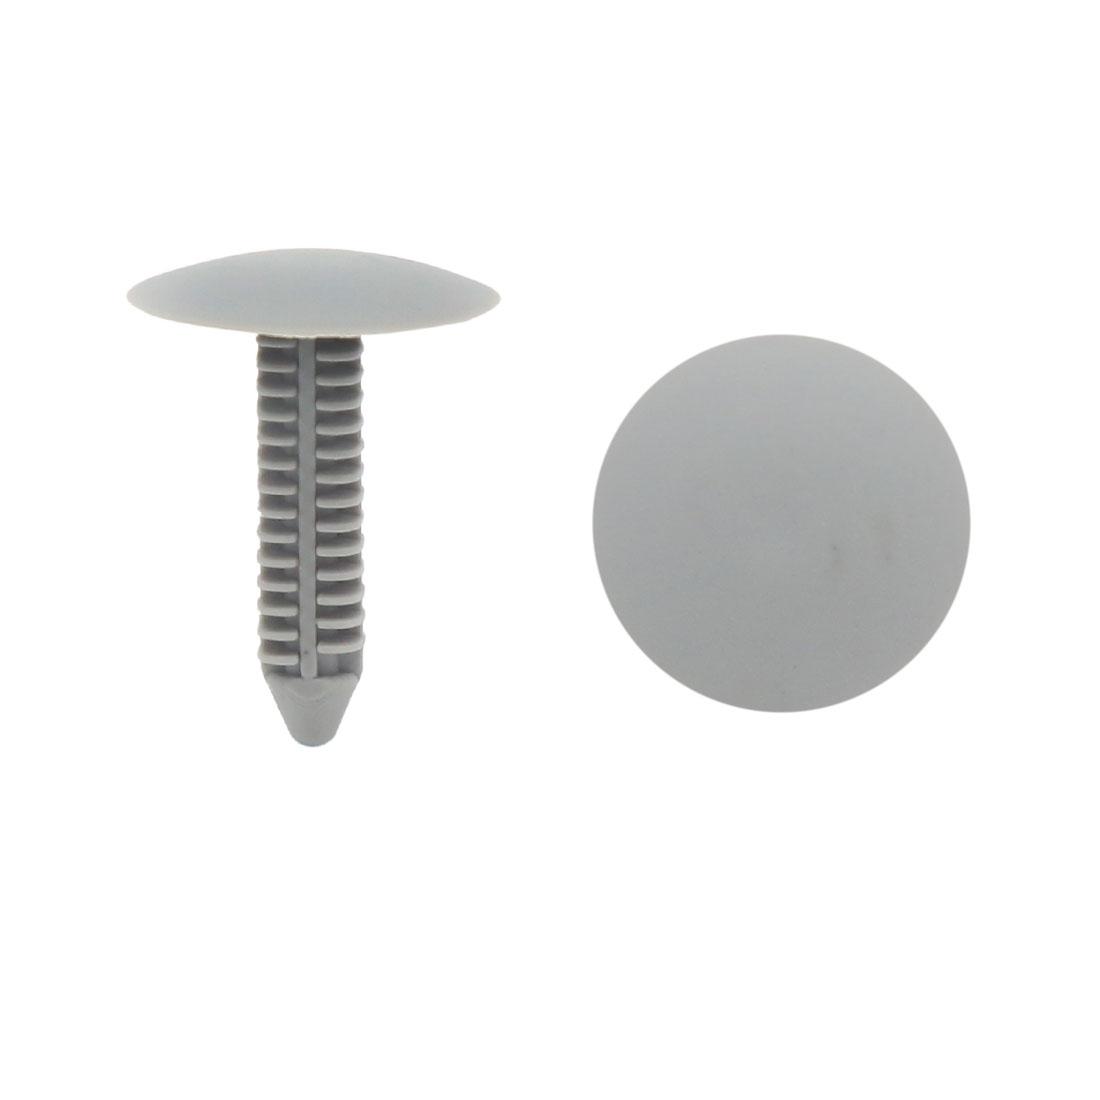 40 Pcs 7mm Hole Gray Plastic Car Door Panel Retainer Clips Rivet Fastener